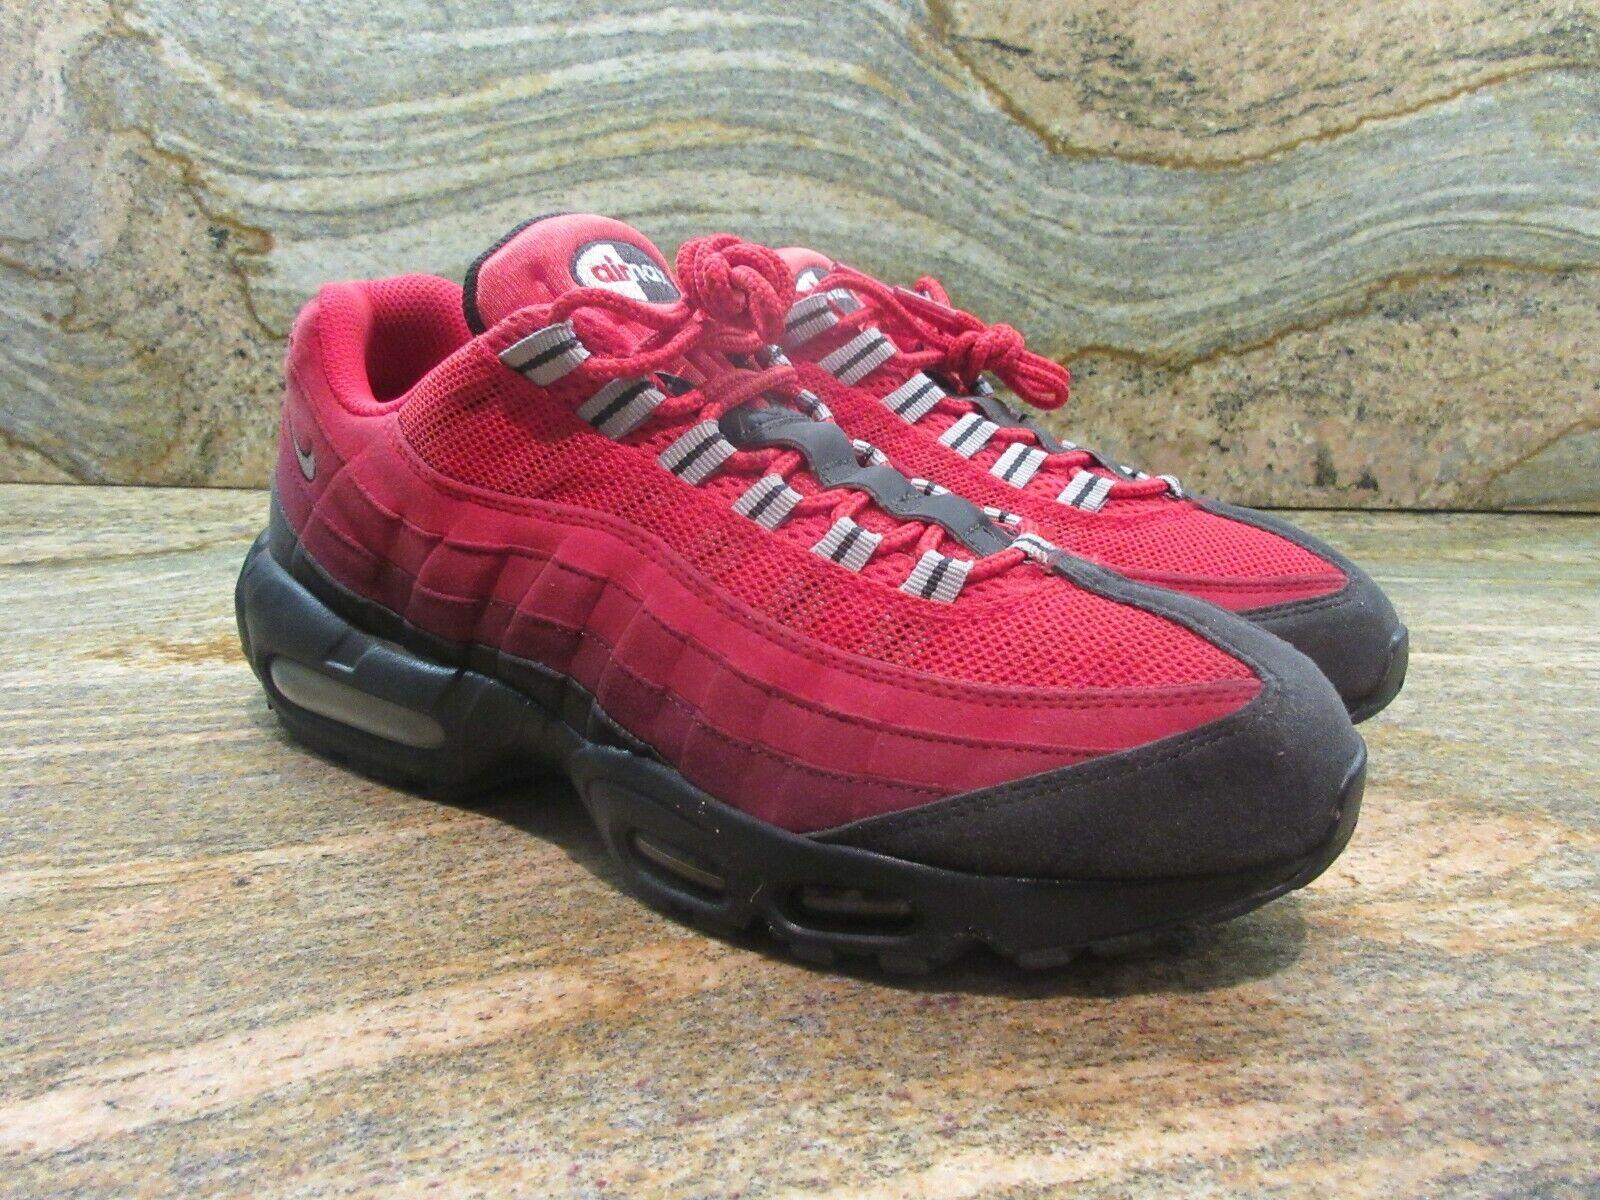 2014 Nike Air Max 95 OG SZ 9.5 Dark Ash Team Red Black Silver PRM 609048-202